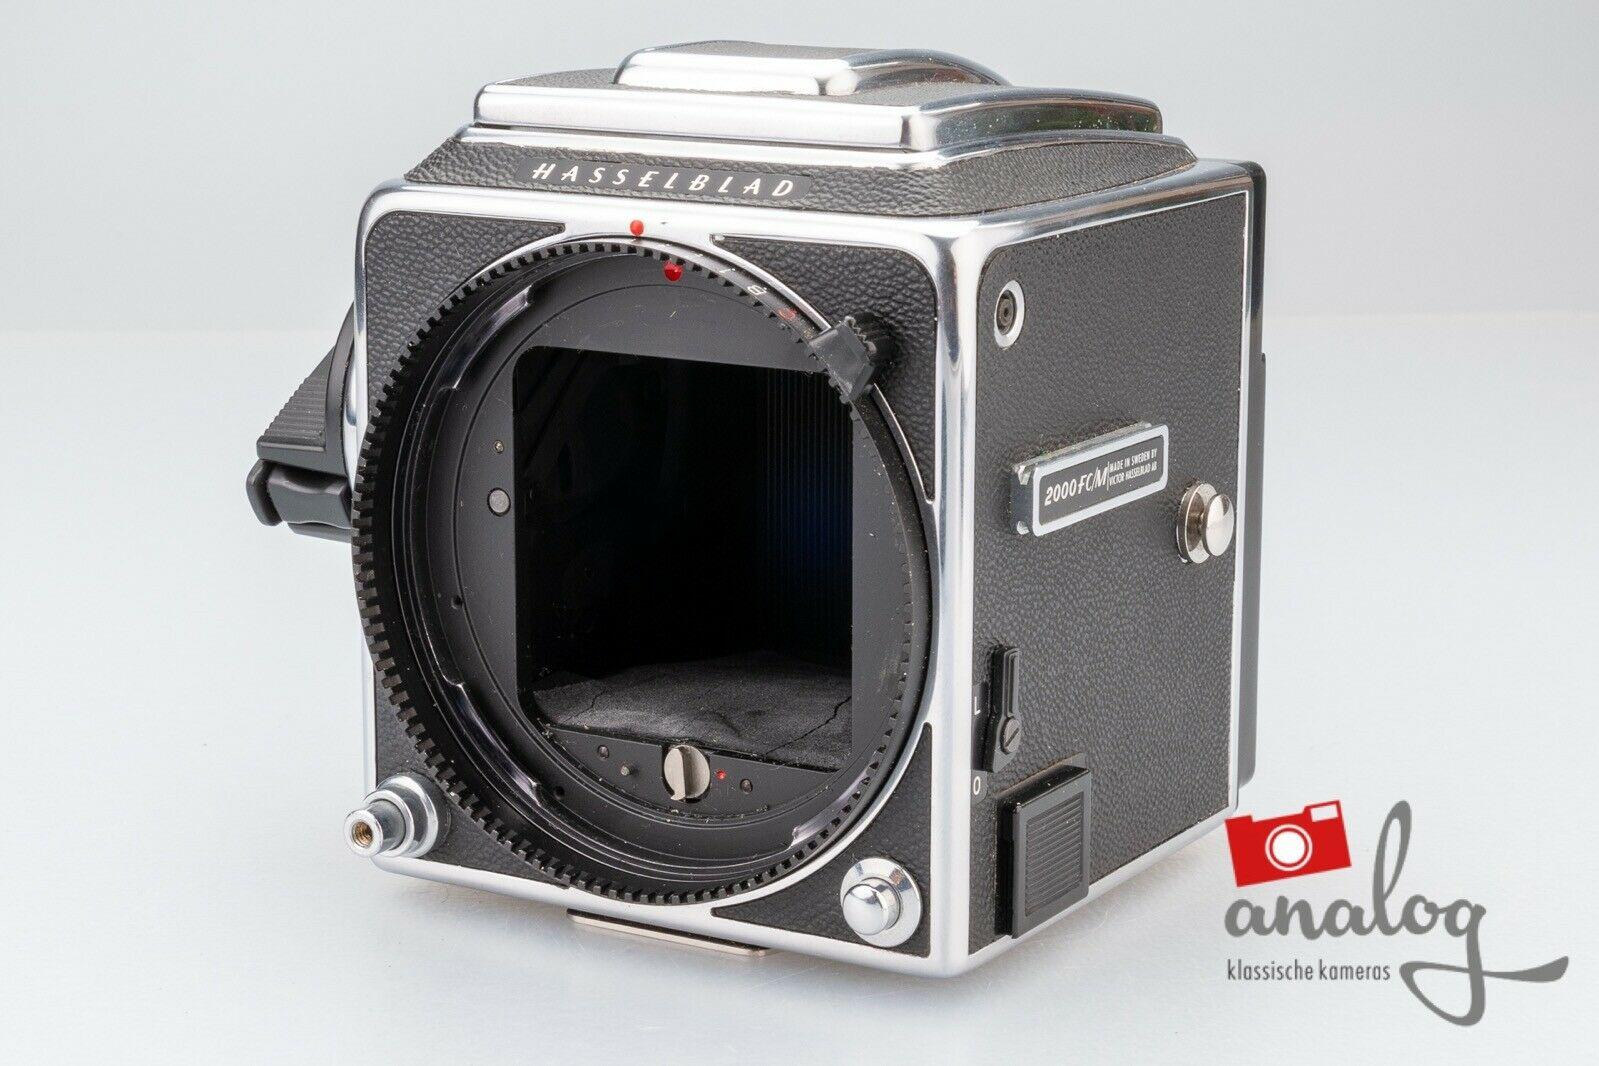 Hasselblad 2000 FC/M chrome - 10316